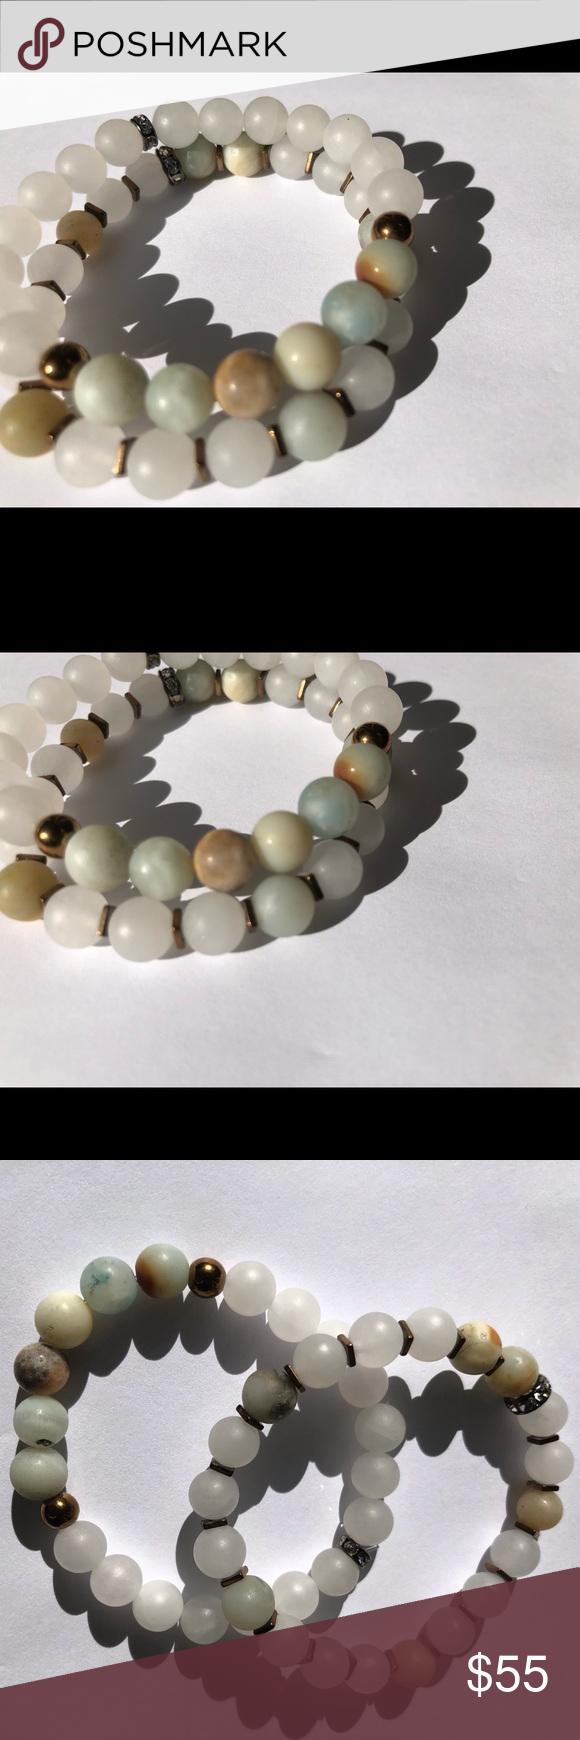 "Handmade White Jade Stone Beaded Energy Fashion Jewelry Bracelet 7.5/"" Gift Box"